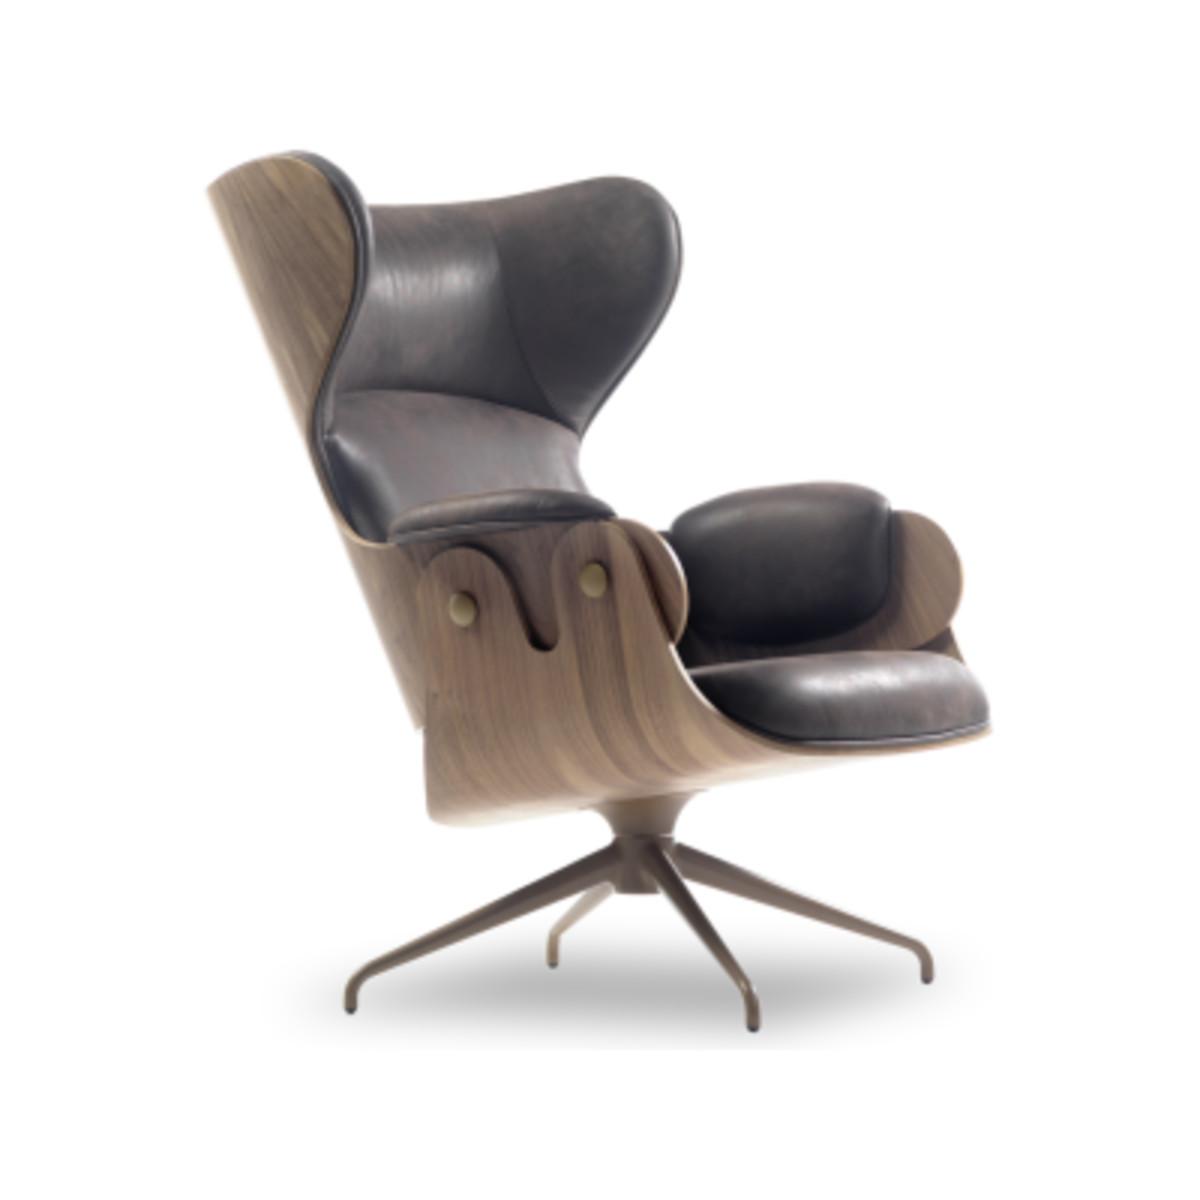 Outstanding Shop Low Lounger Armchair Swivel Base Set Of 2 Creativecarmelina Interior Chair Design Creativecarmelinacom